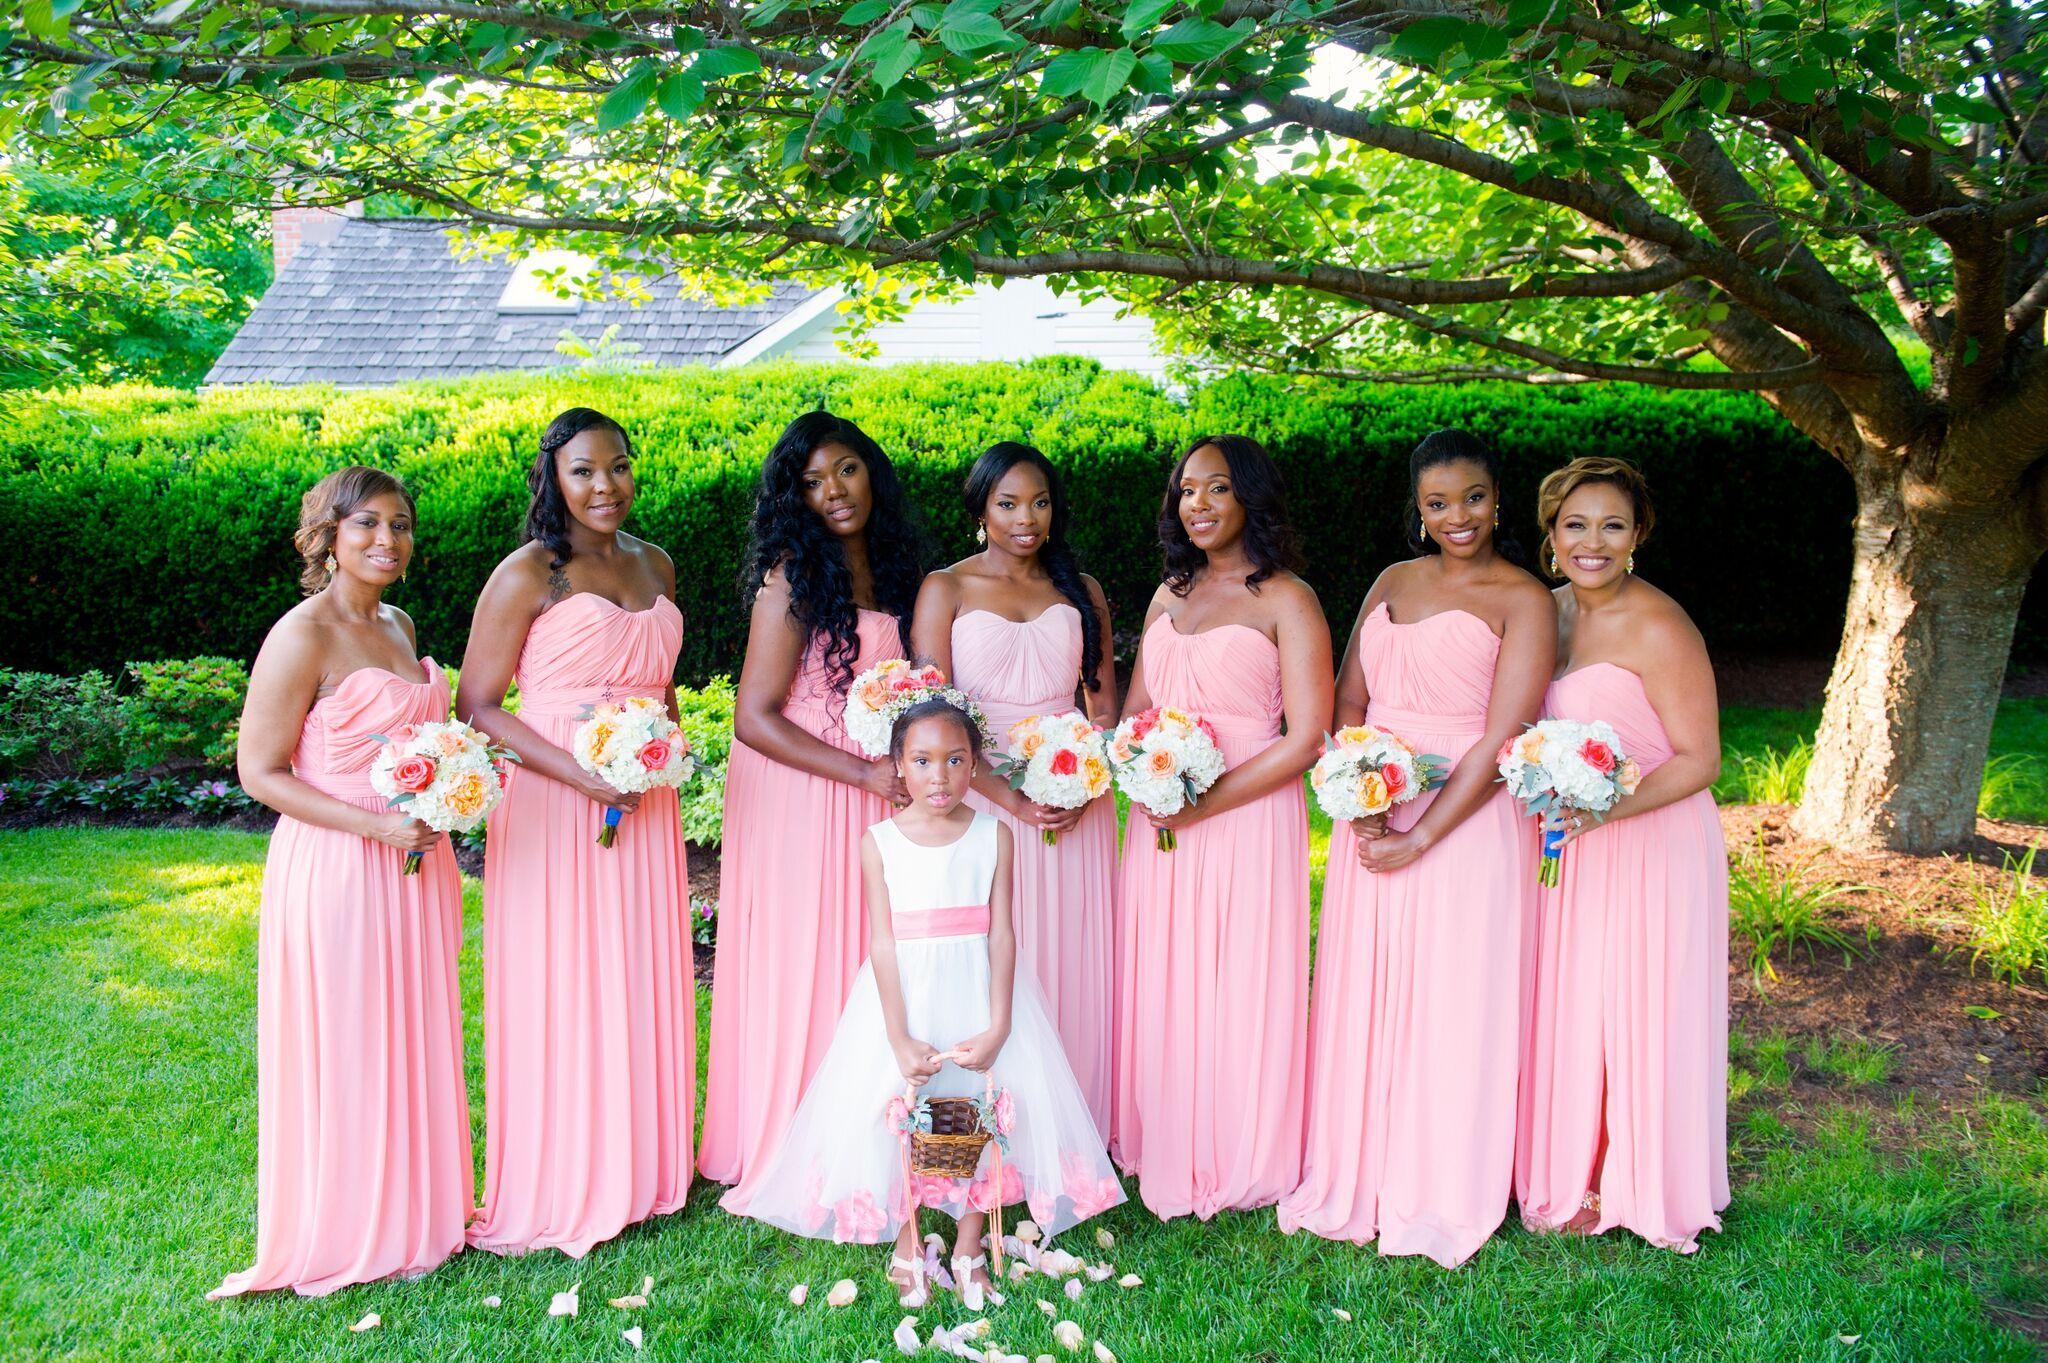 Blush bridesmaid dresses | Dana + Sean\'s Wedding at The Antrium ...